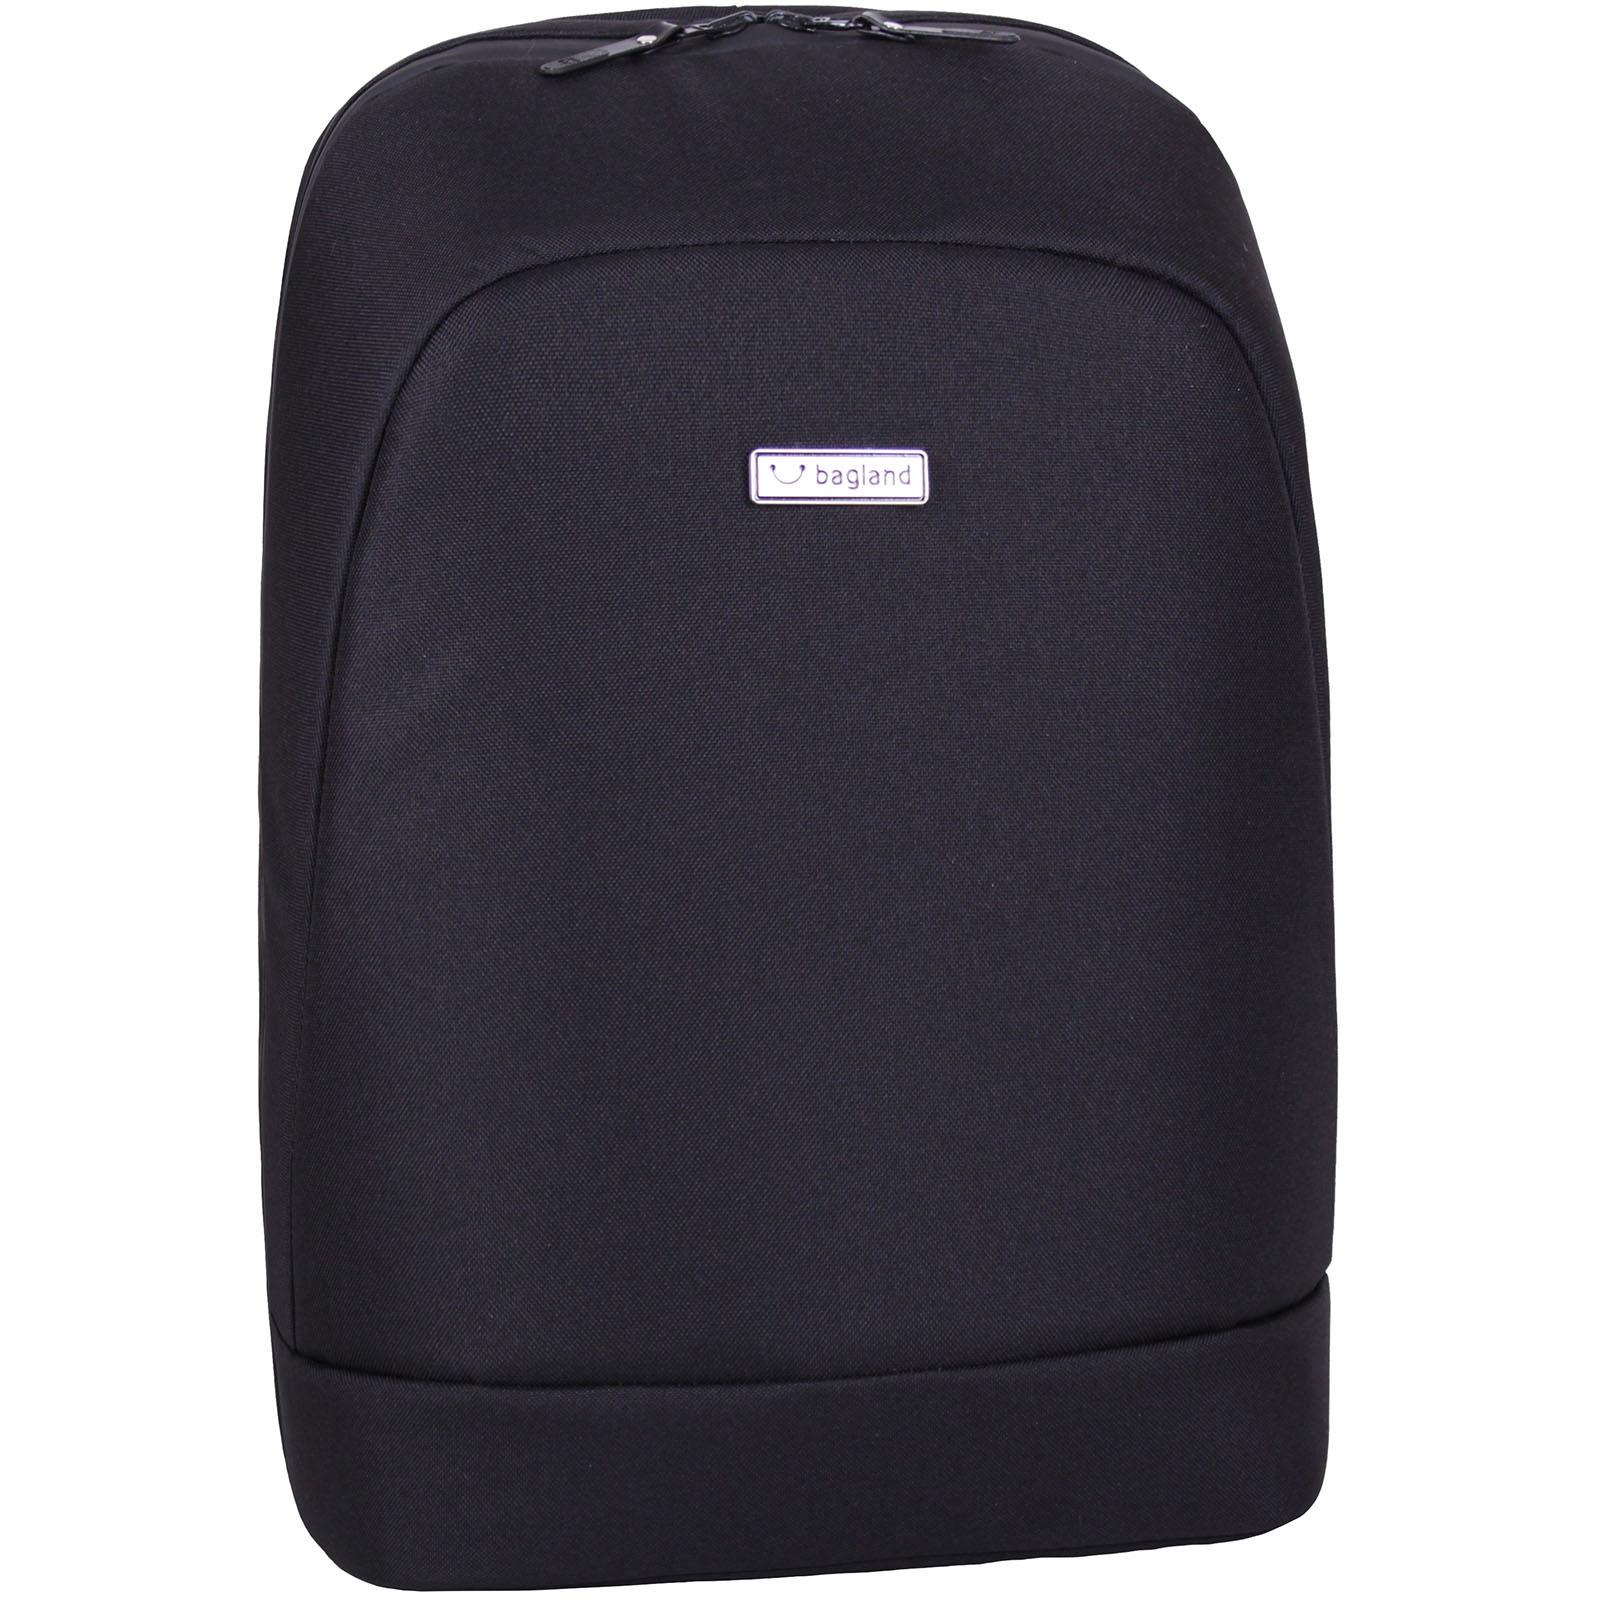 Рюкзаки для ноутбука Рюкзак для ноутбука Bagland Advantage 23 л. Чёрный (0013566) IMG_2526.JPG